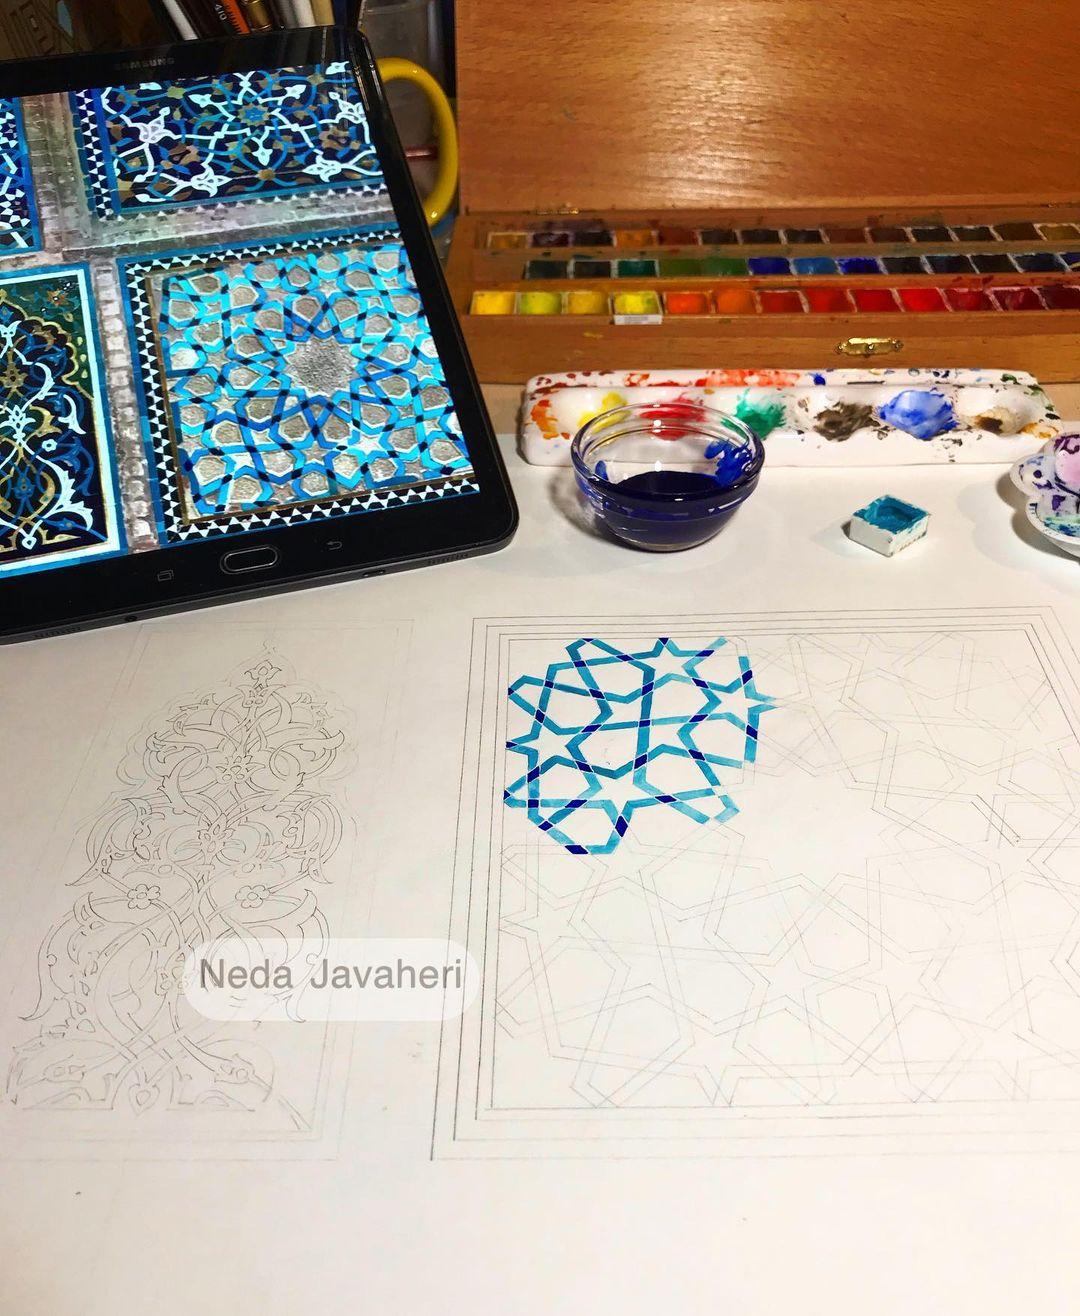 Karya Kaligrafi  و آدمی بزرگ میشود، اما به مرور… کم کم یاد میگیرد کاری به کار دنیا نداشتهبا…- Ne Javaher